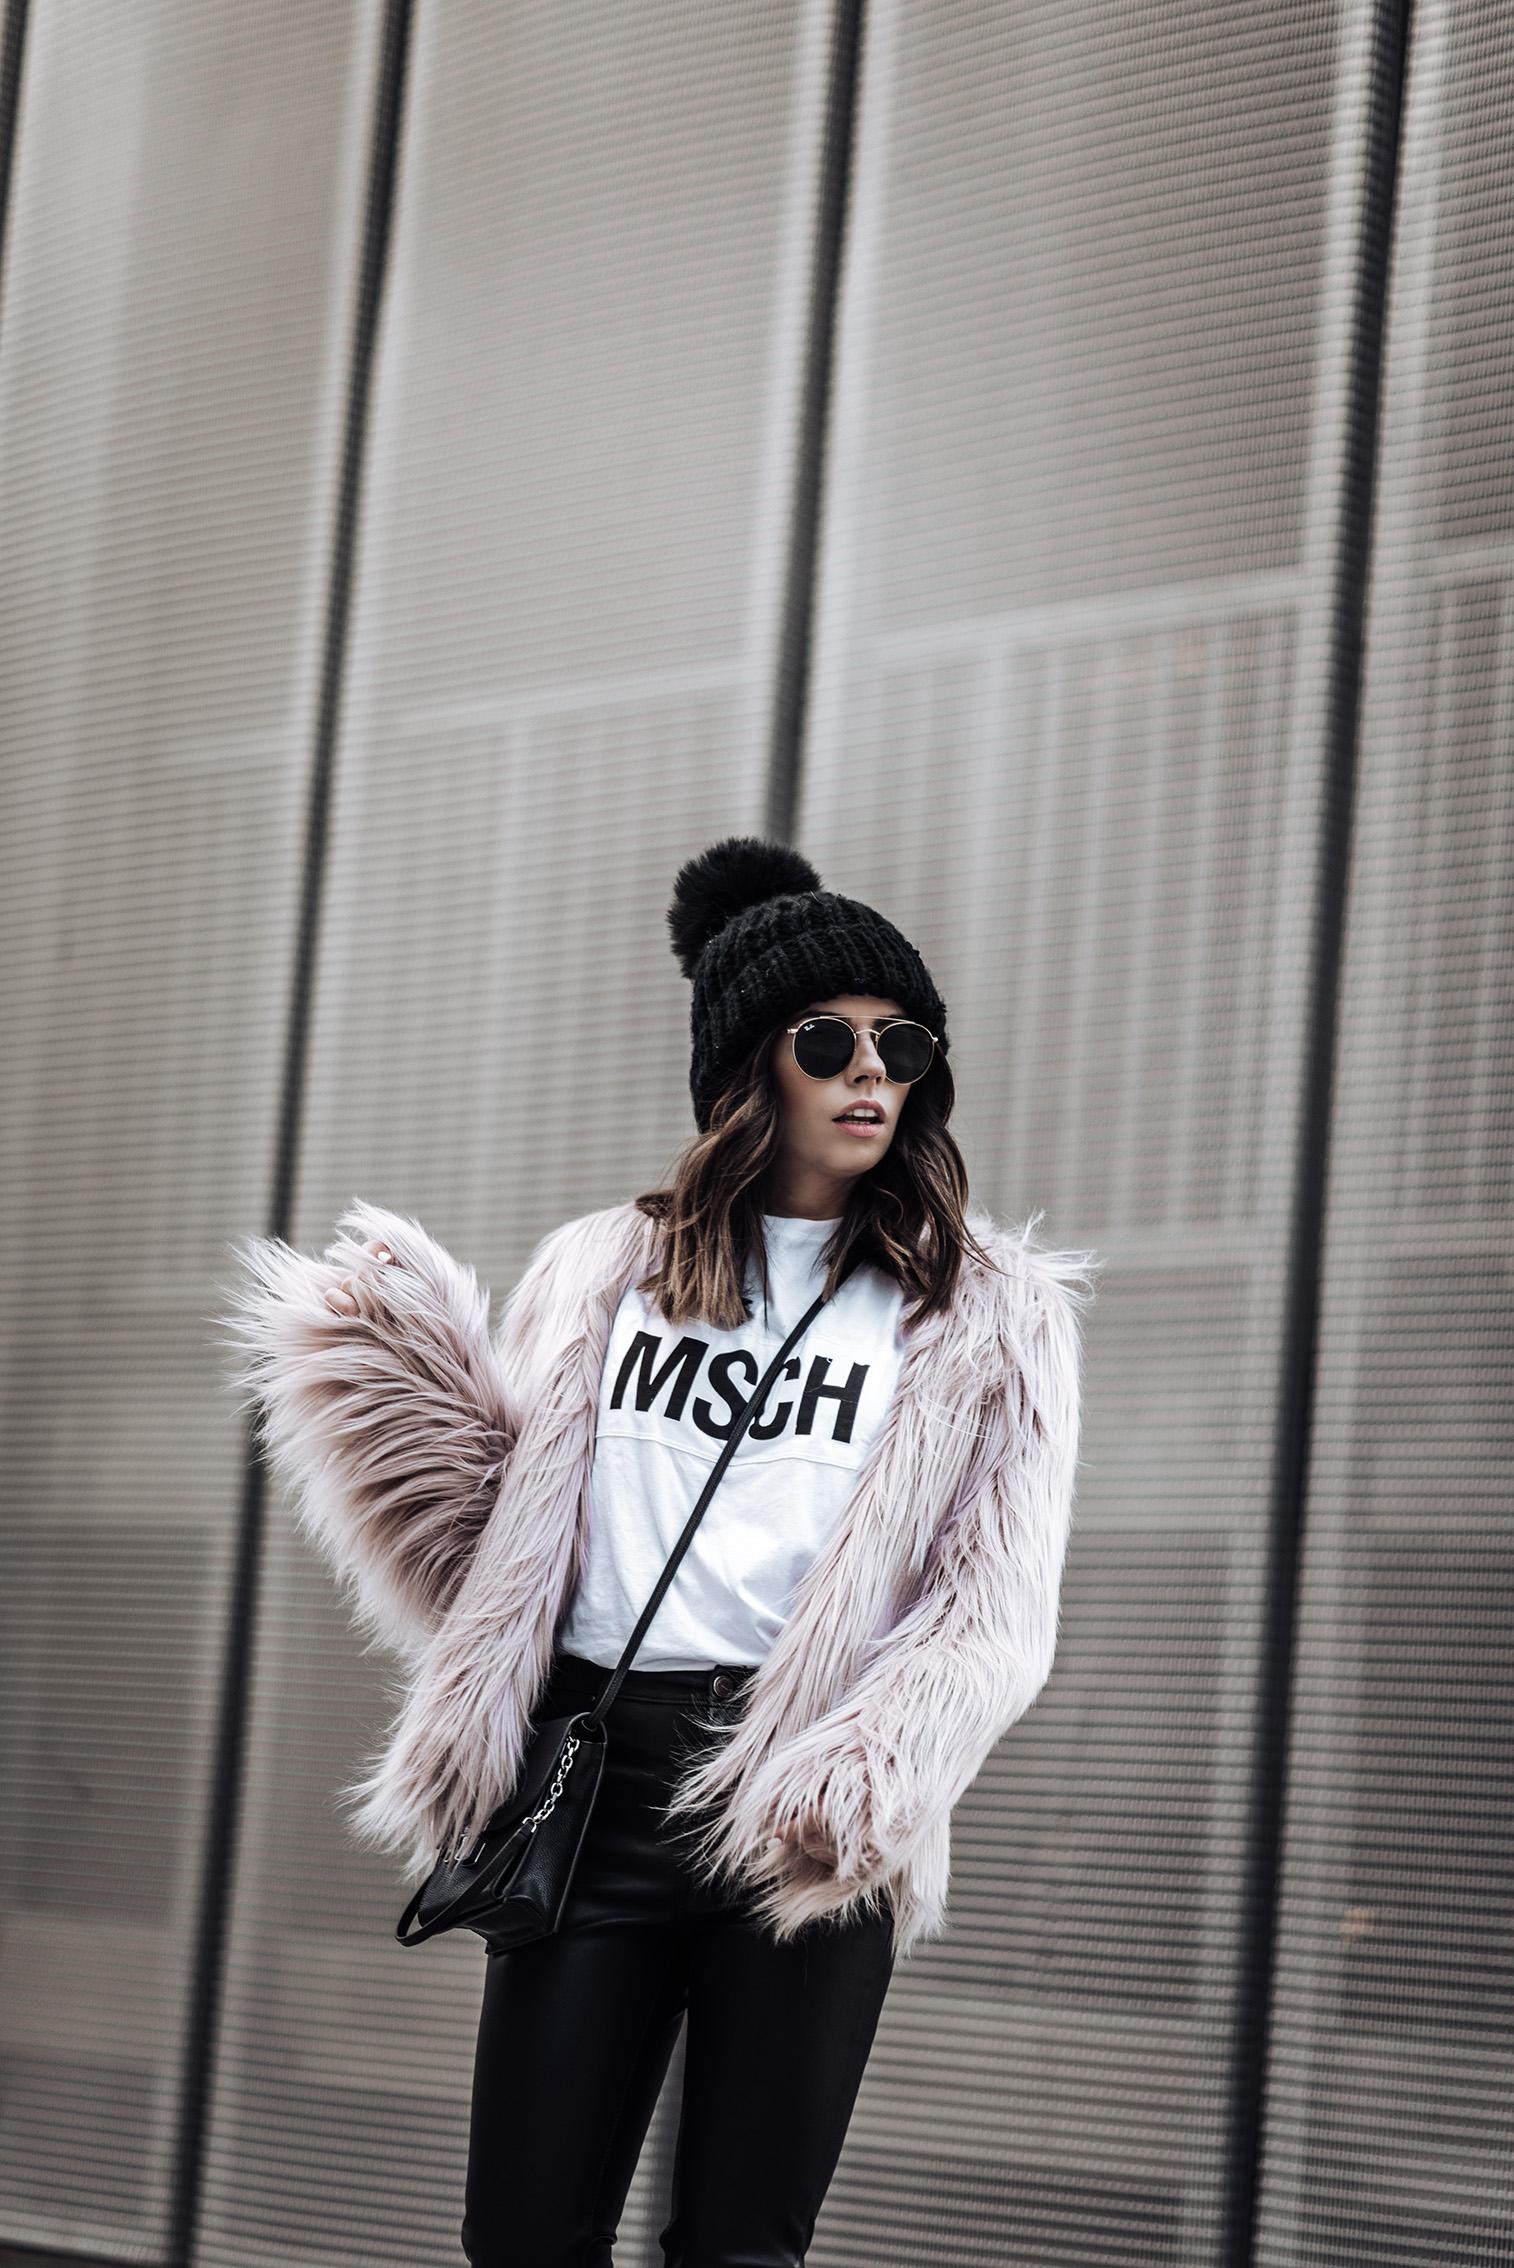 Click to shop the look: Pop of pink | Pink Unreal Fur Coat | MSCH T Shirt | The Principle Mid Rise Vegan Leather Skinny Jeans | {C/O} Henri Bendle Peru Bag | Vans Old Skool sneakers #streetstyle